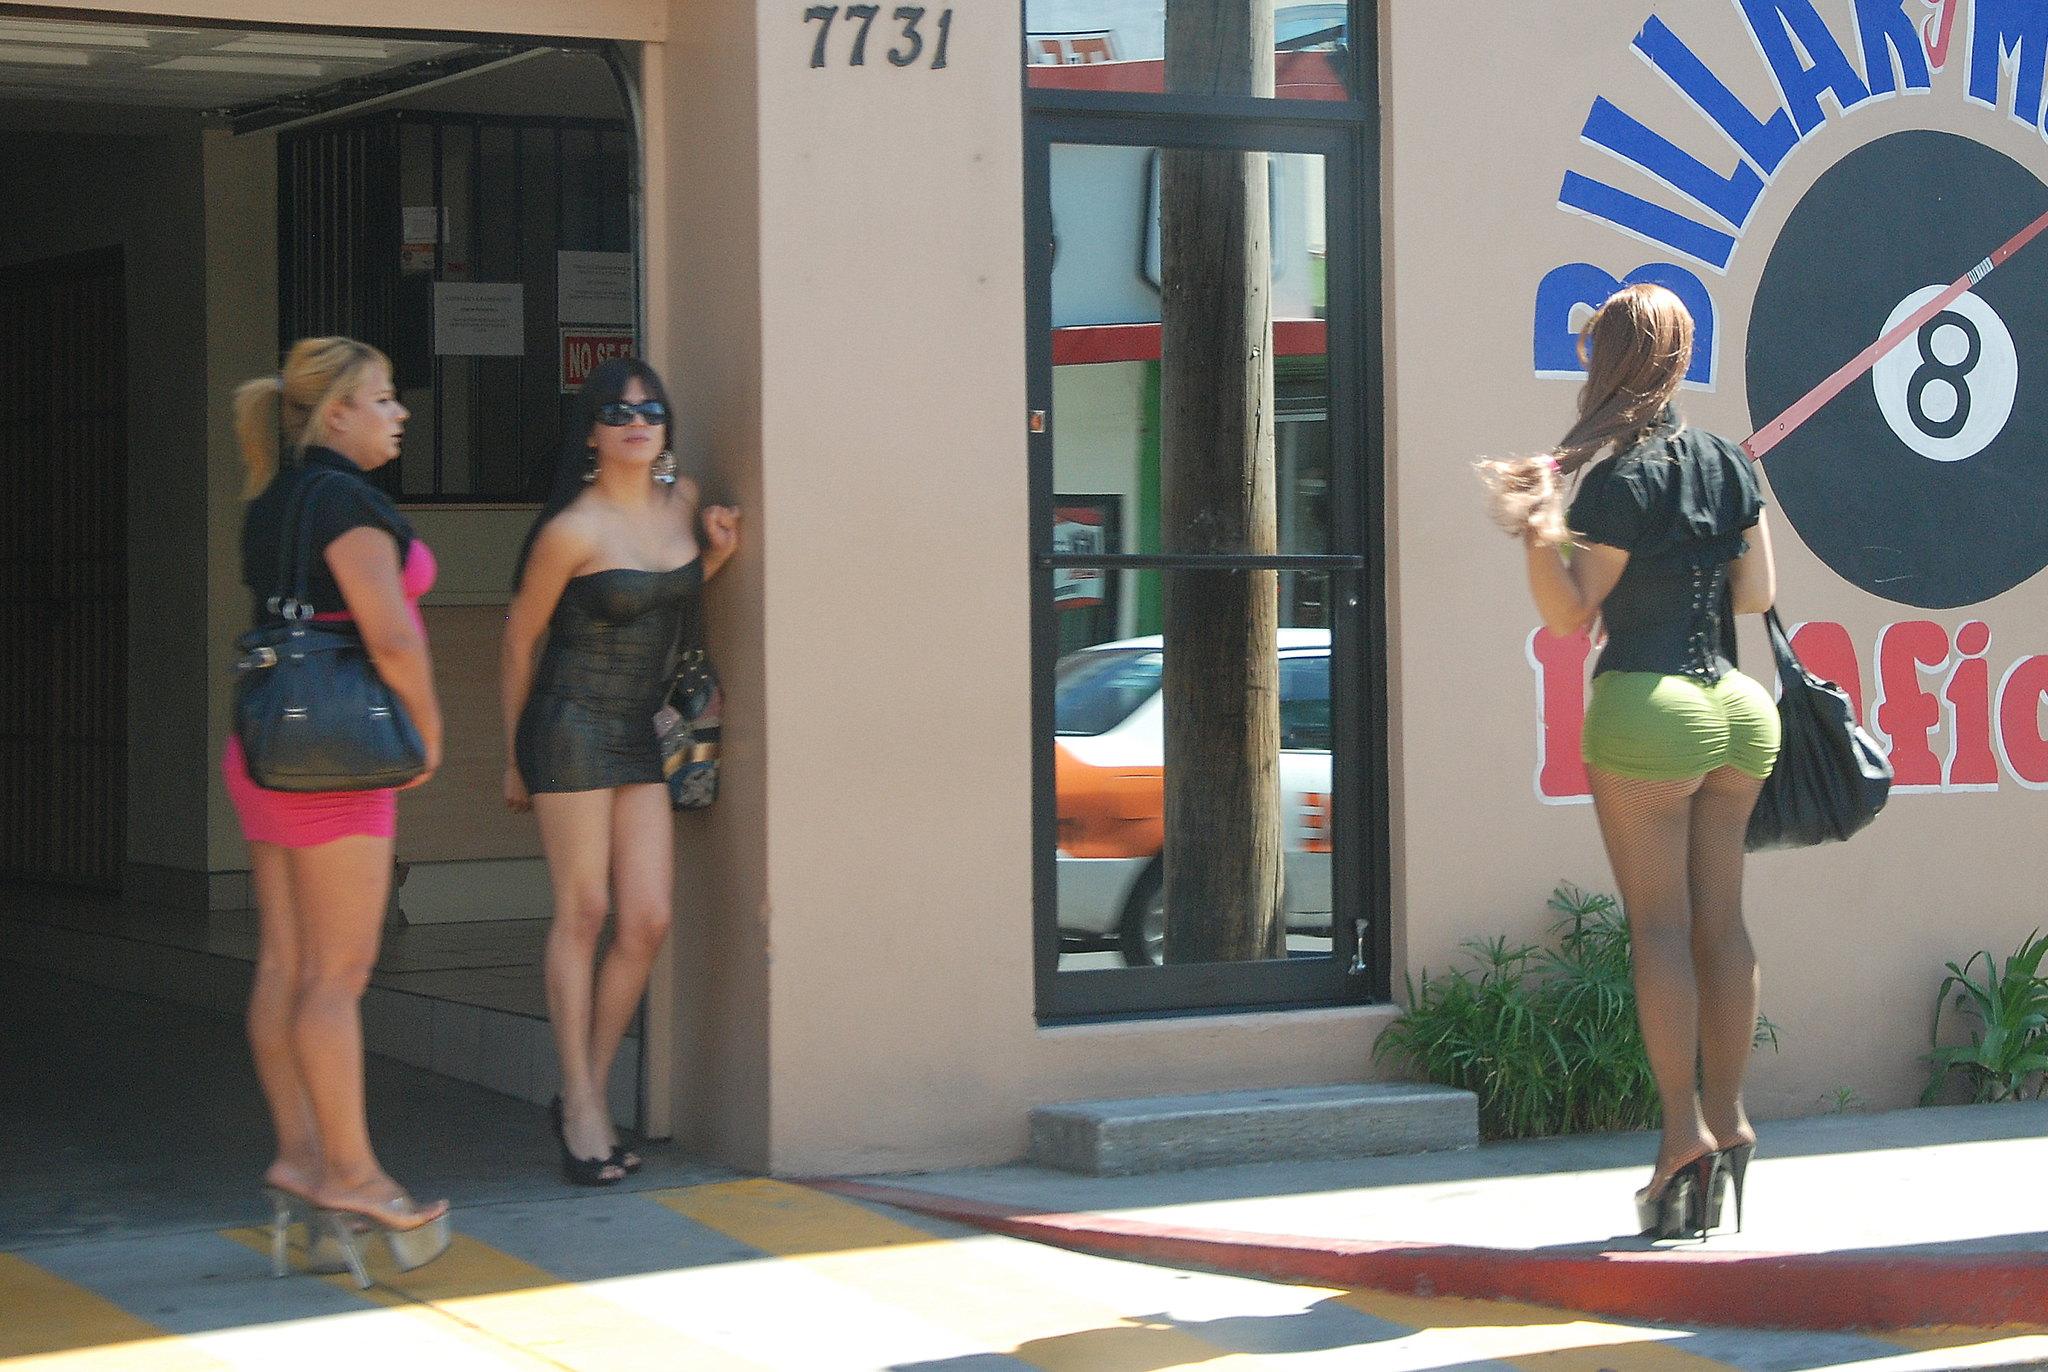 image San diego street prostitute